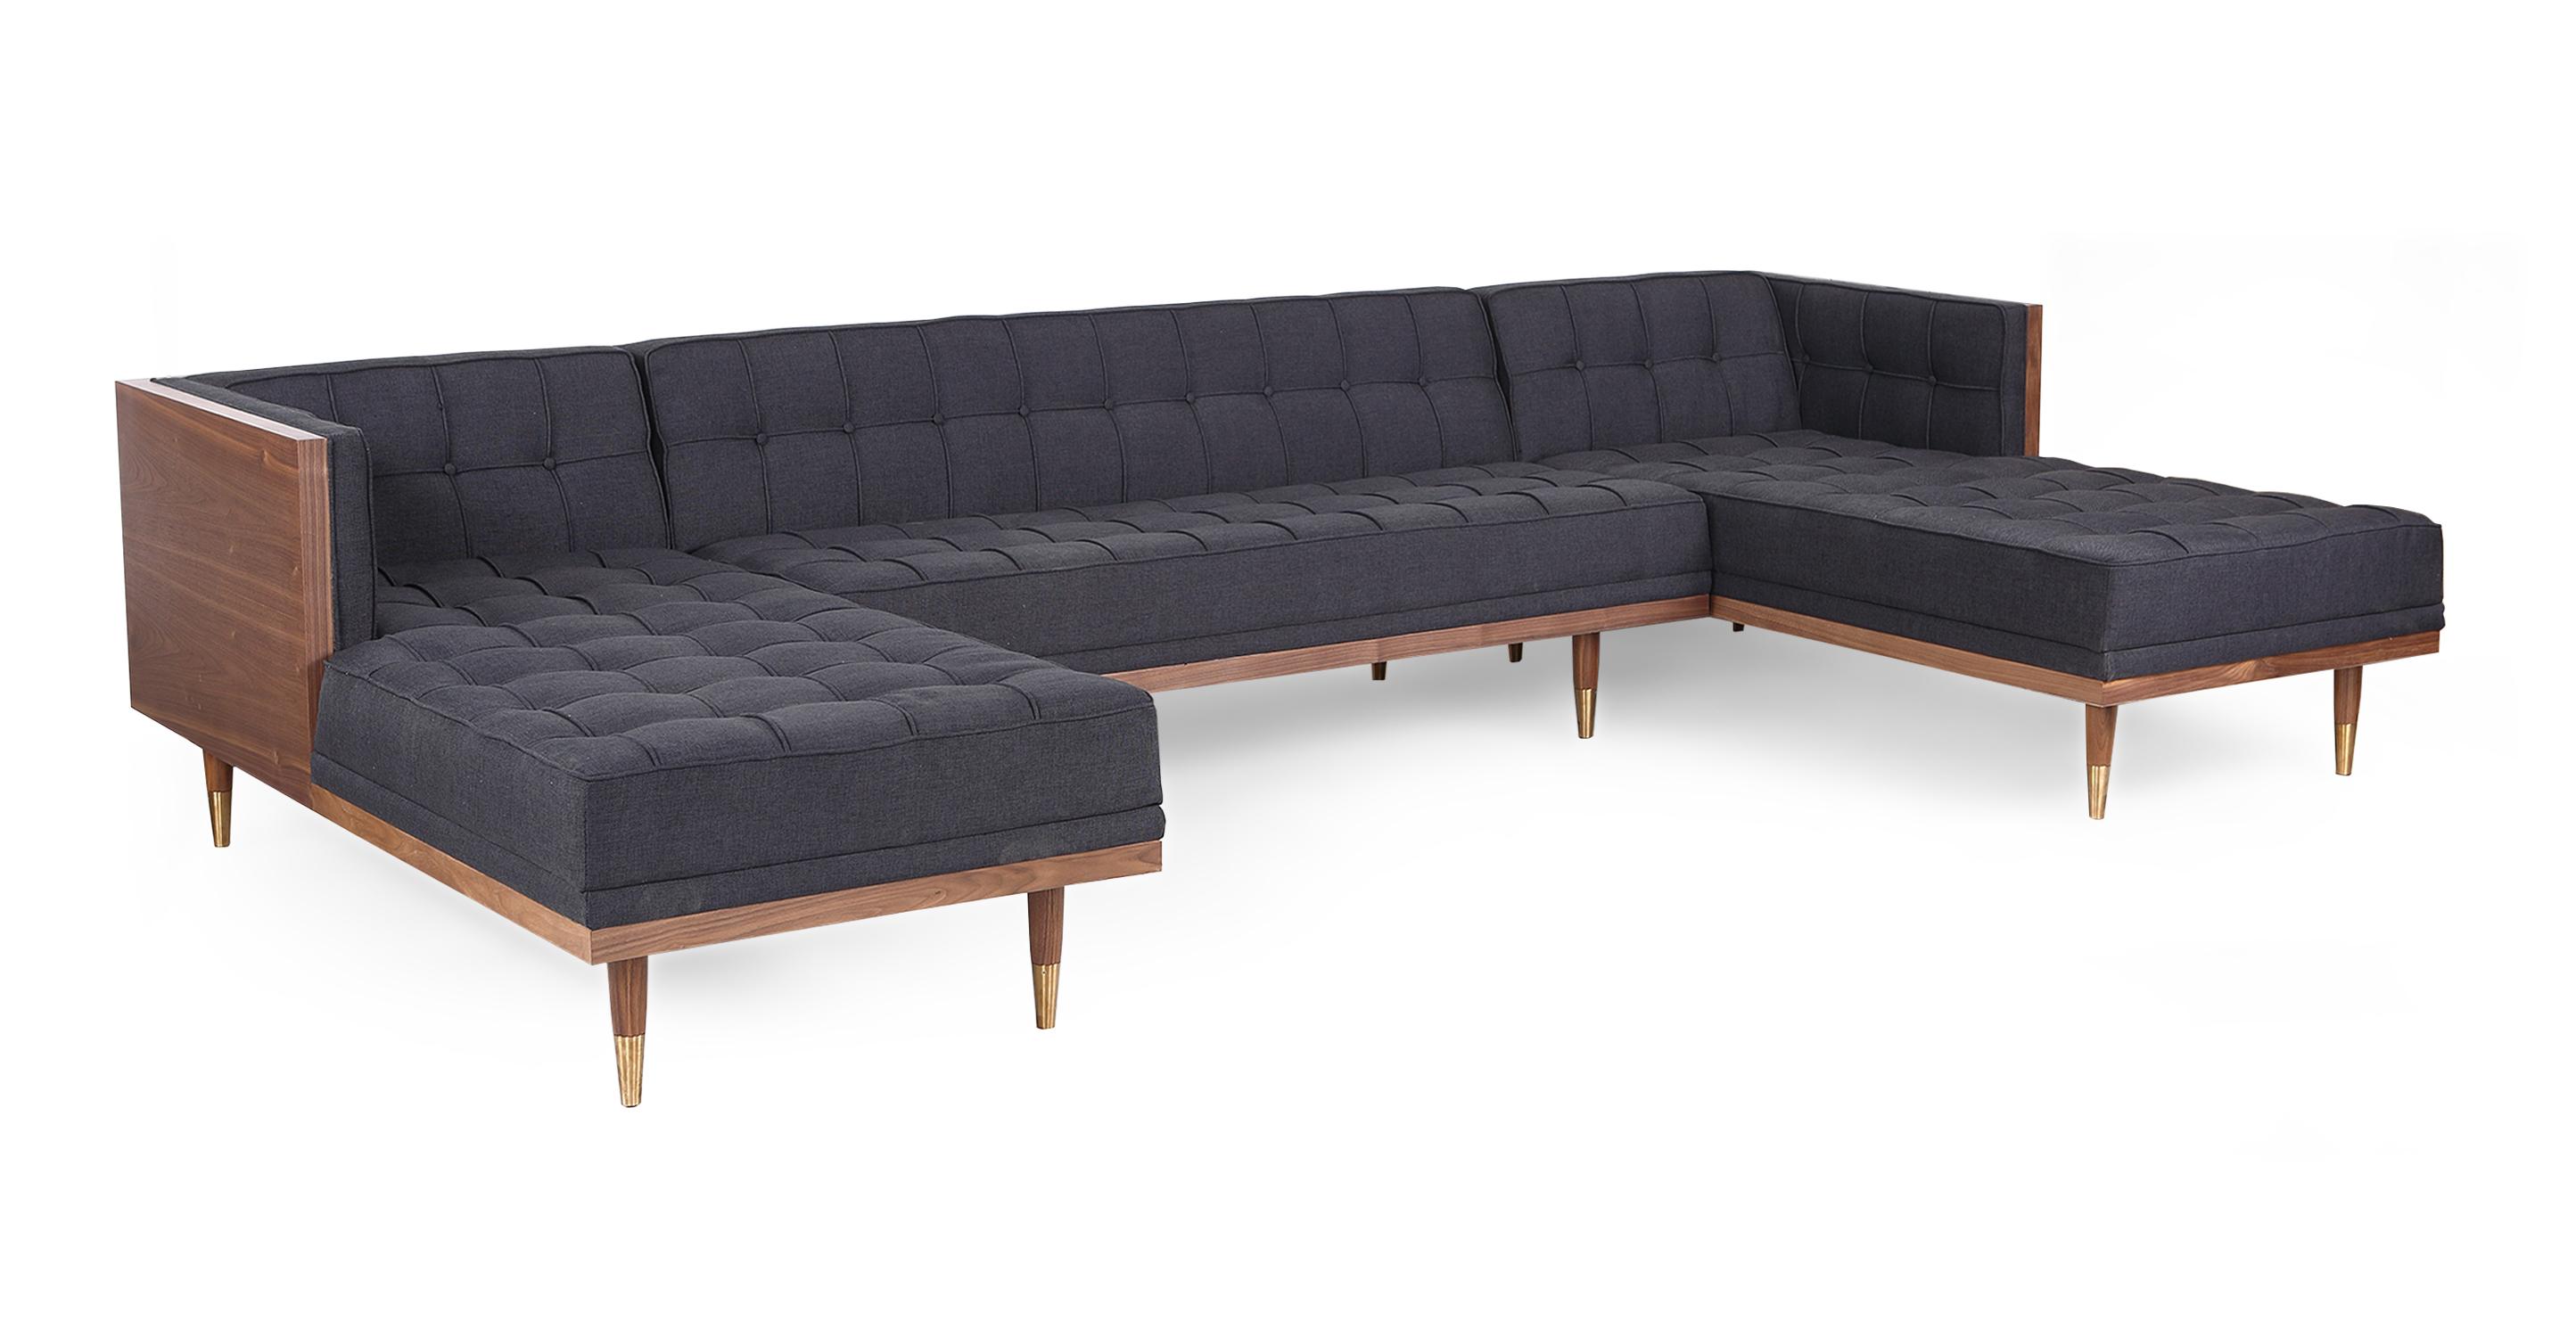 "Woodrow Box 126"" Fabric Sofa U-Sectional, Walnut/Urban Ink"